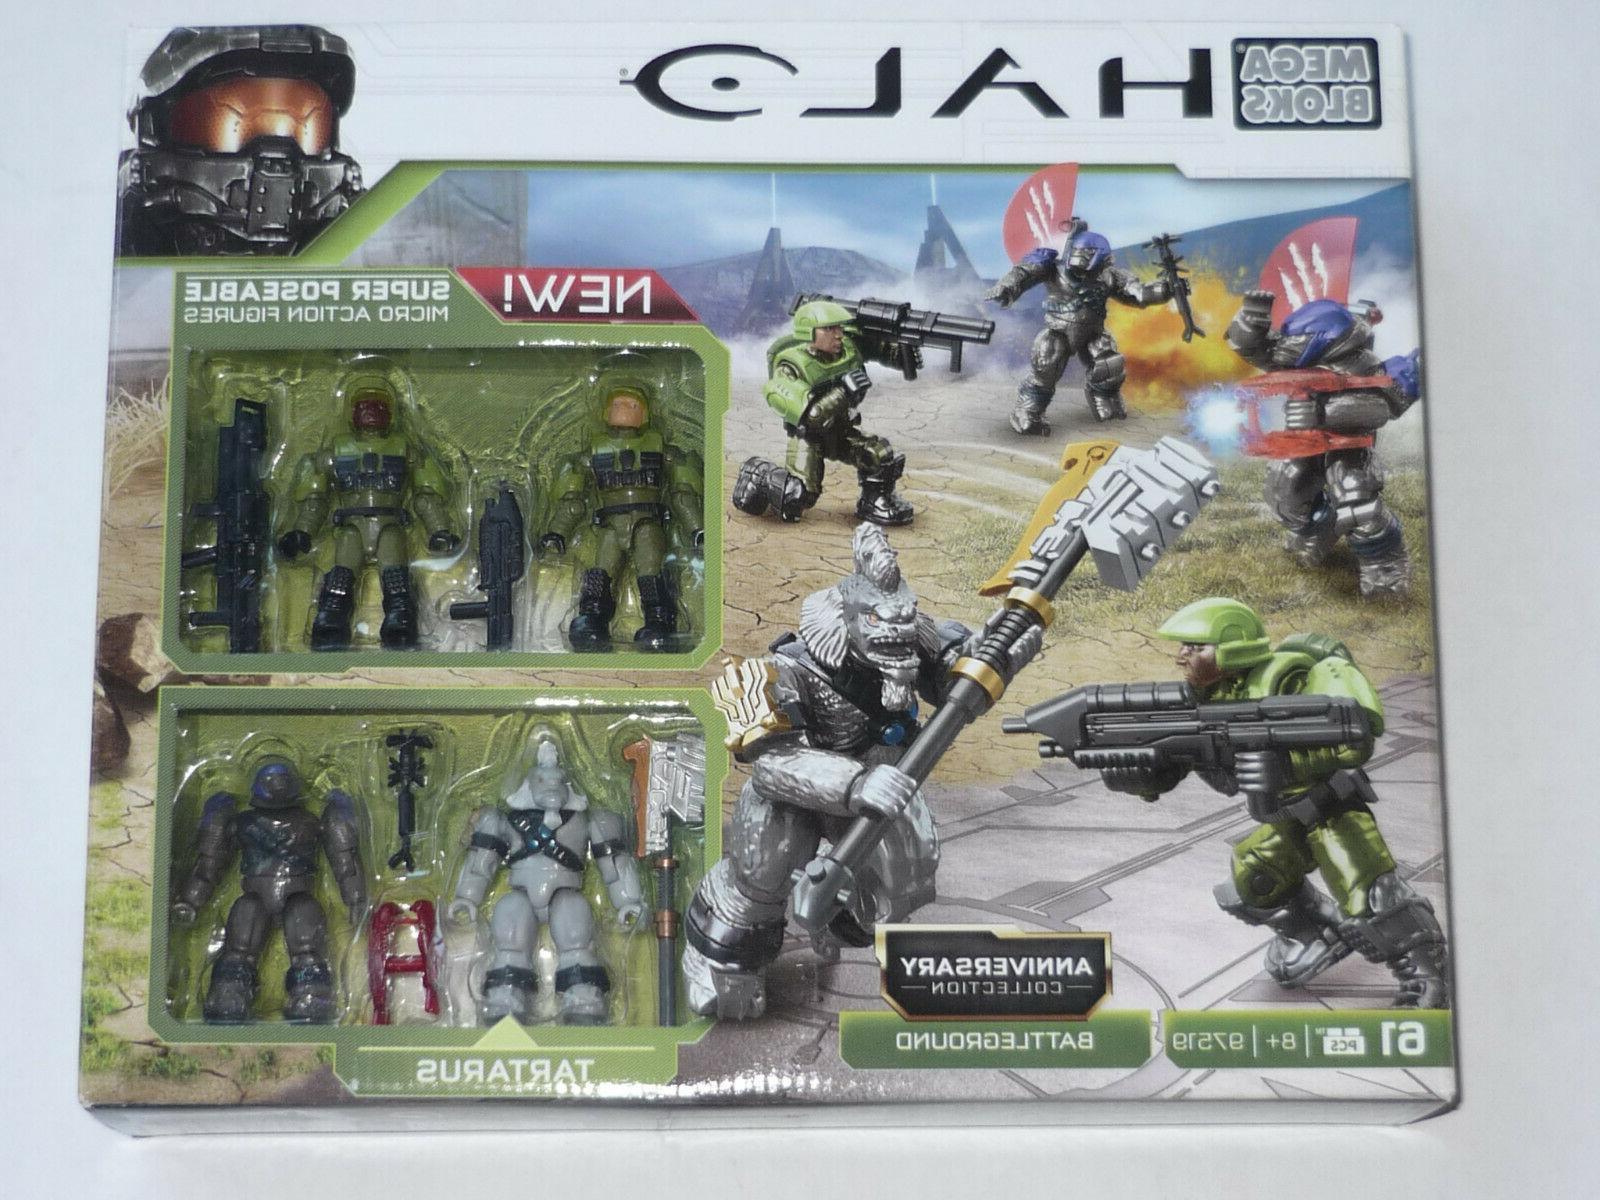 halo 97519 battleground action figure anniversary collection